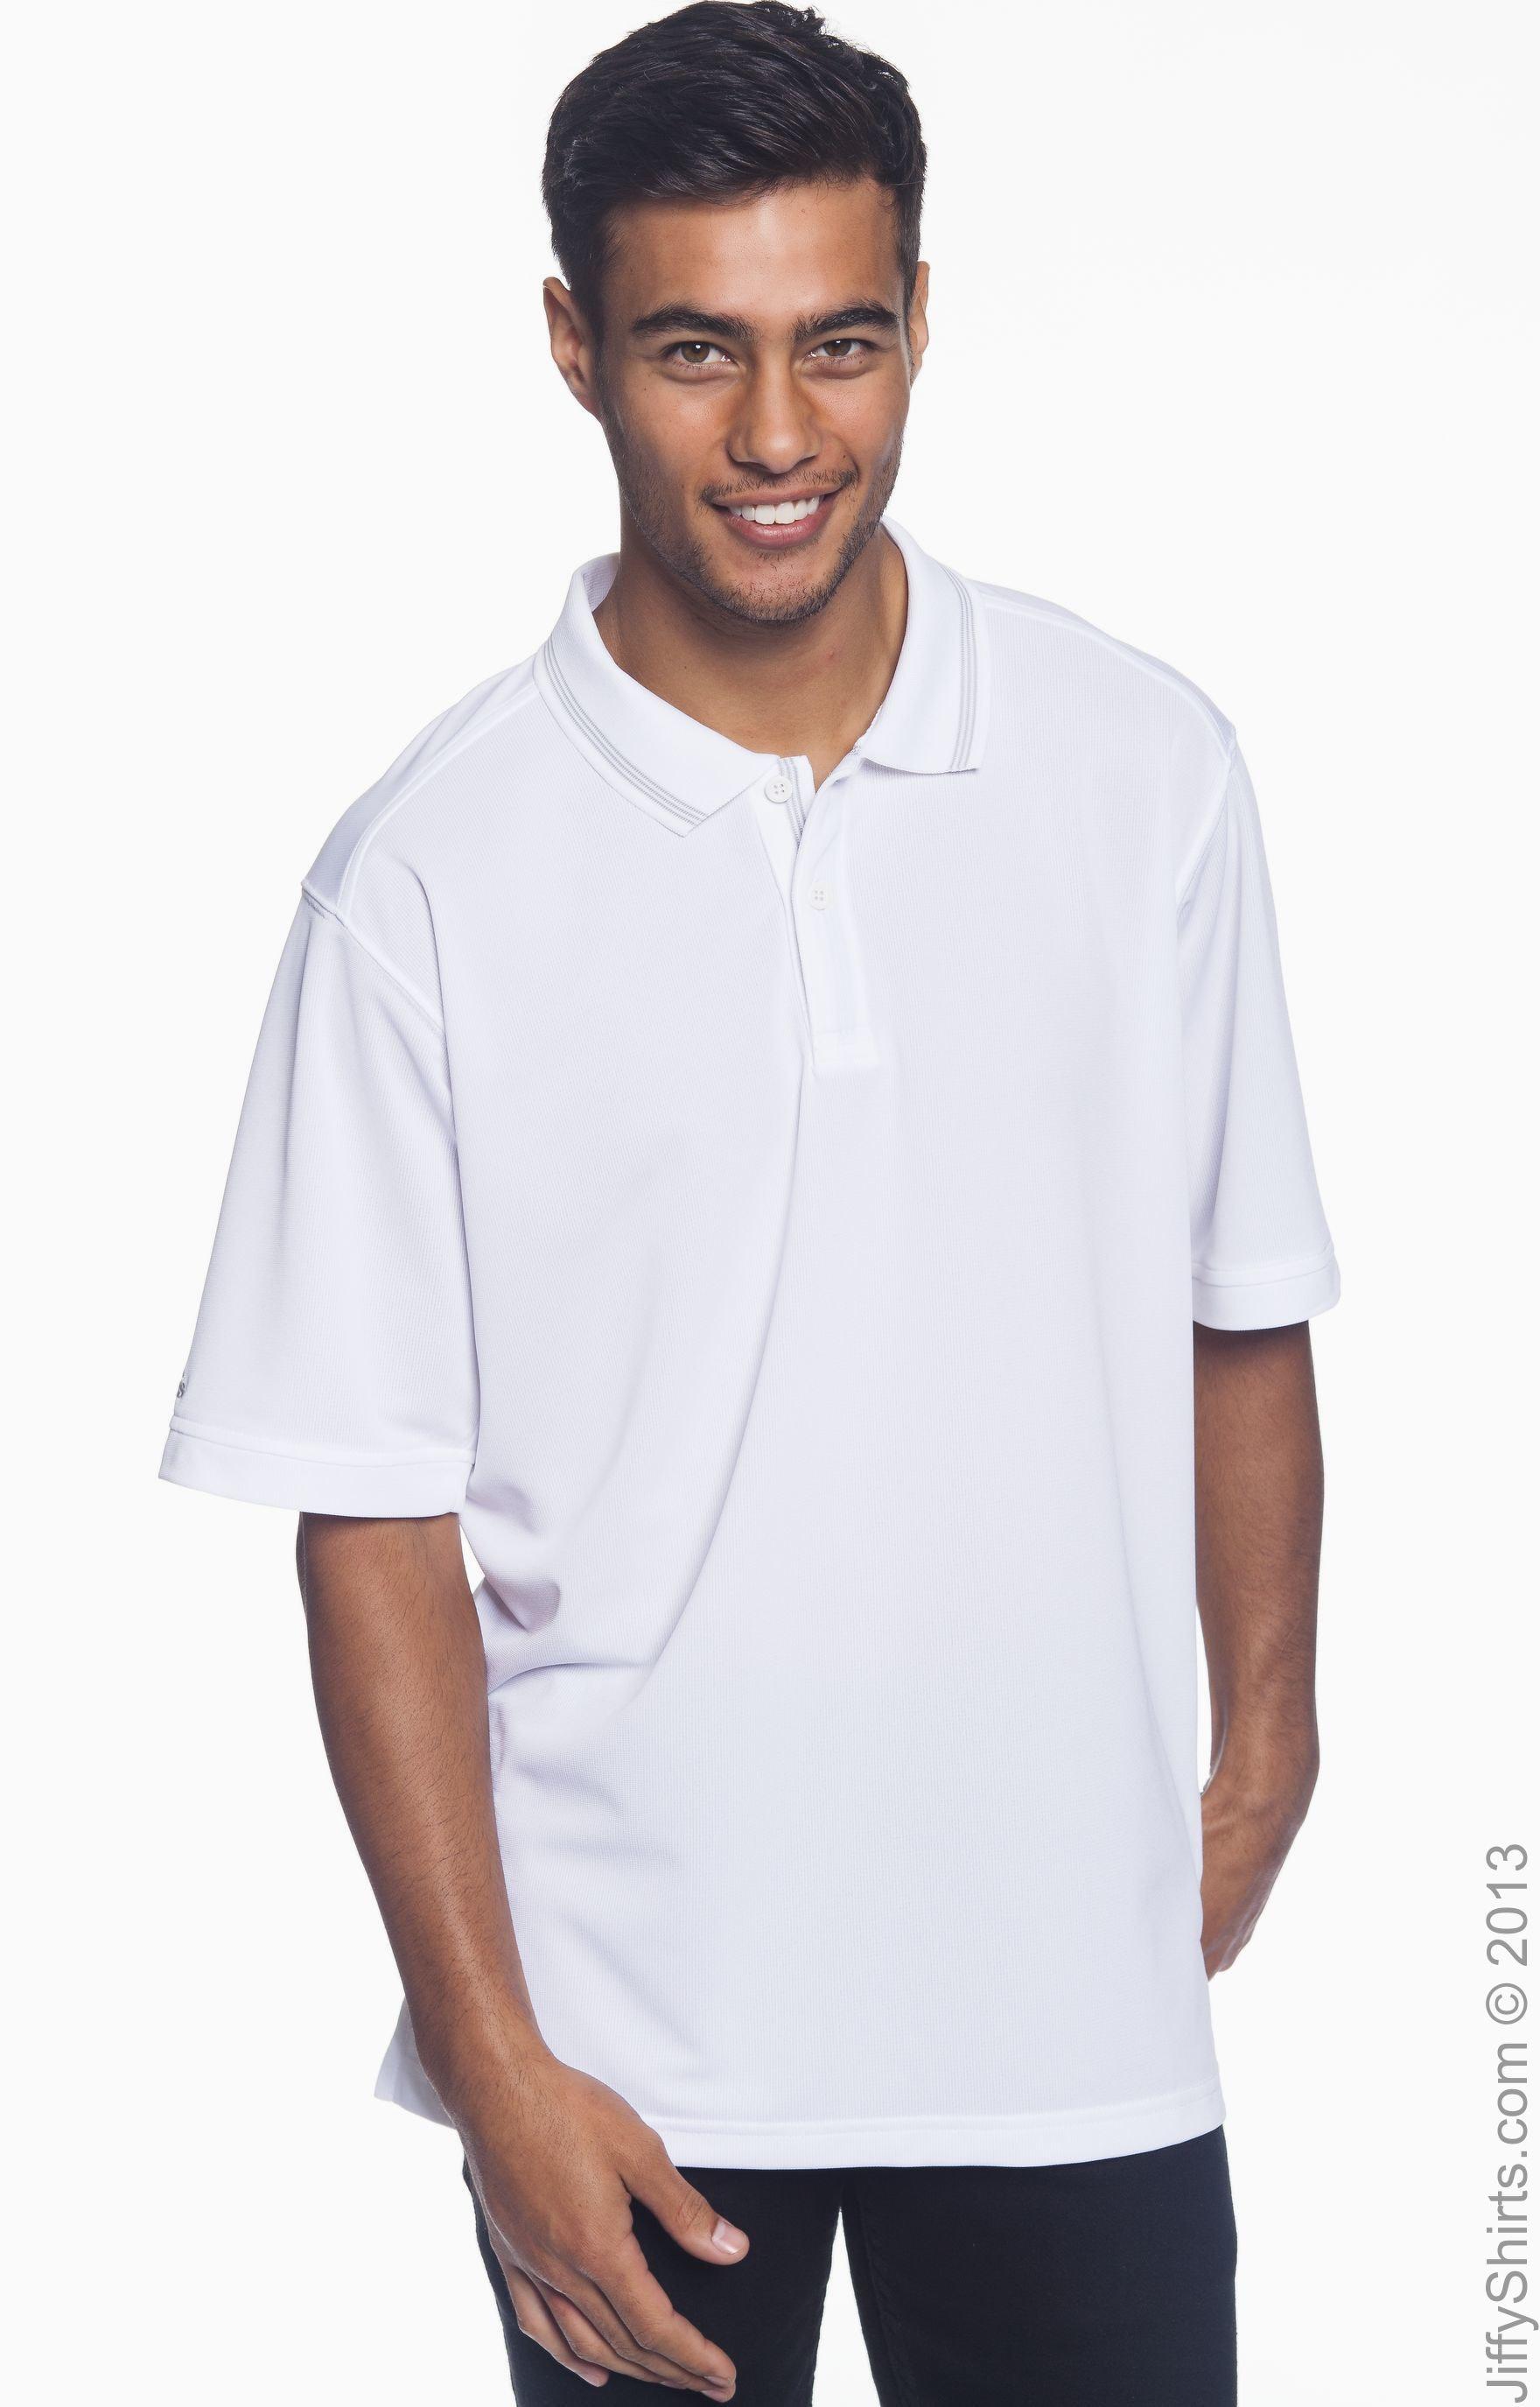 Adidas A14 White/Ice Grey